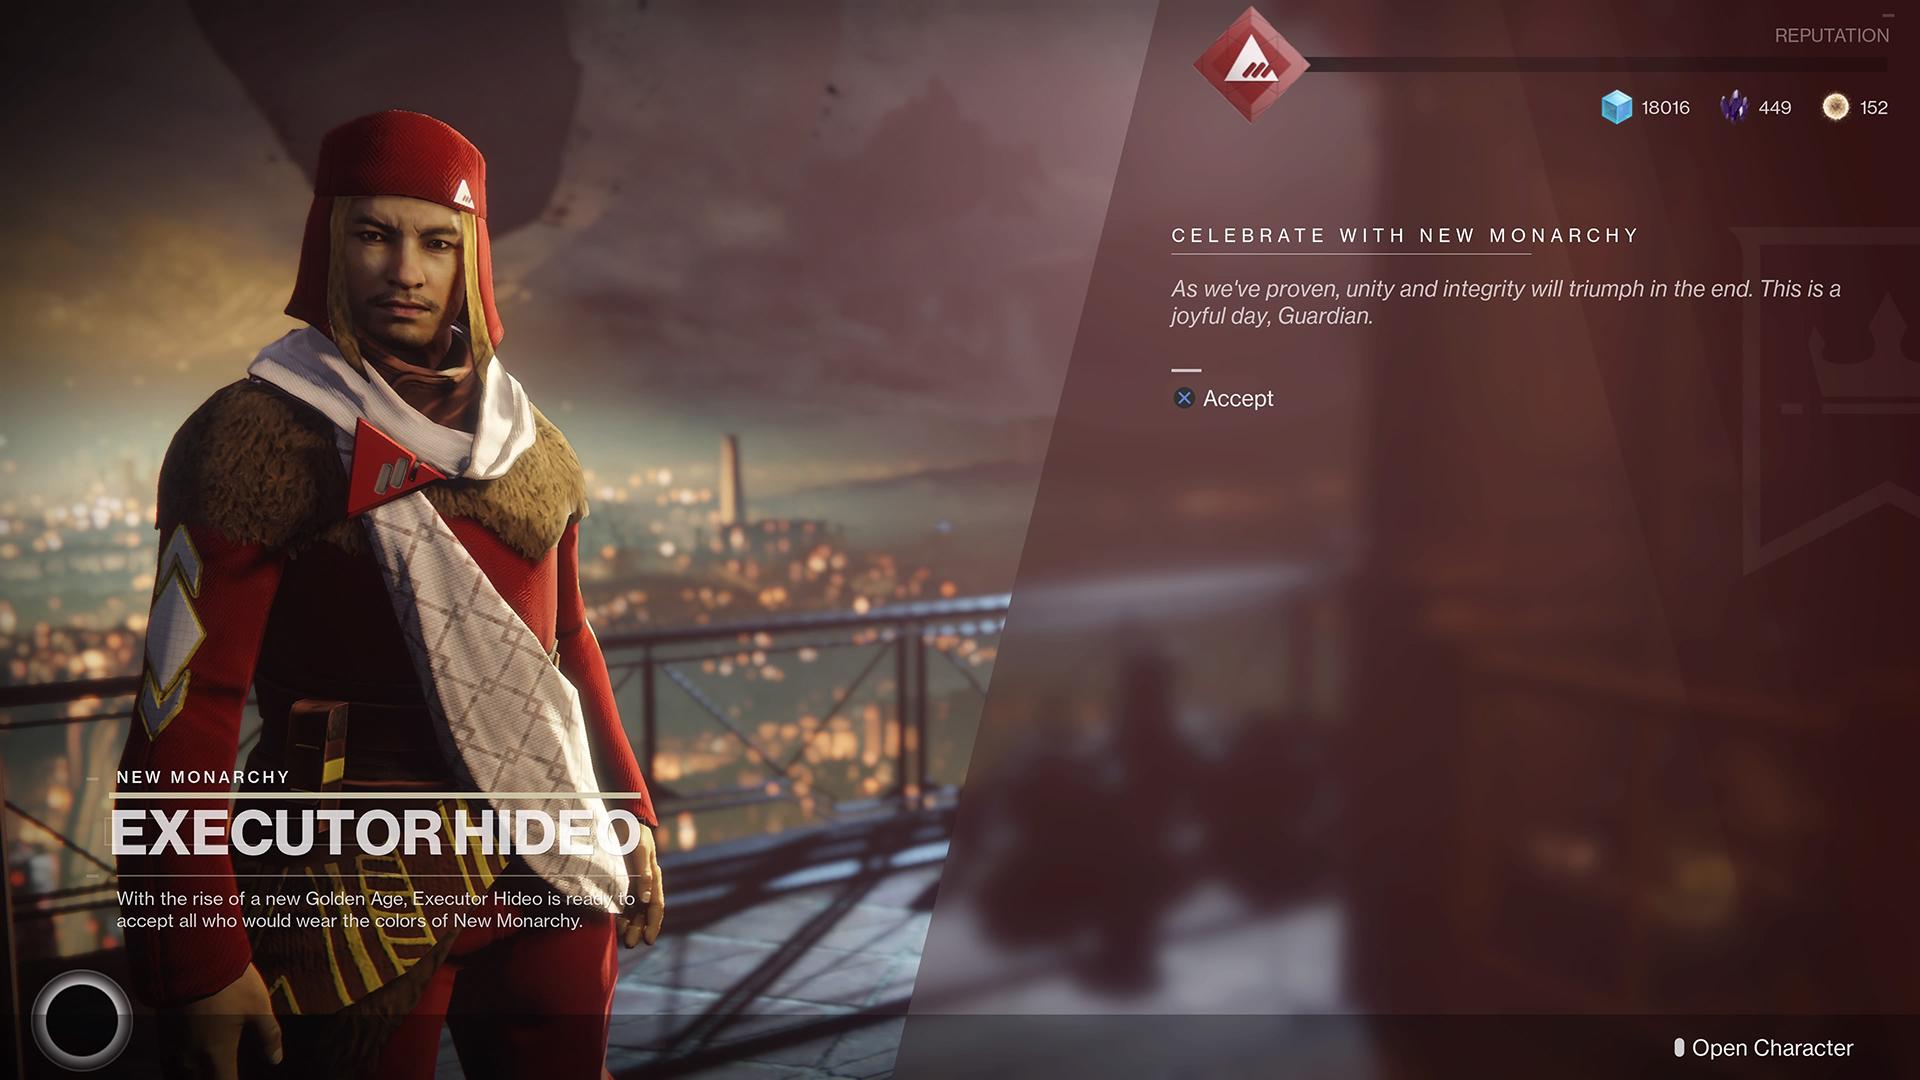 New Monarchy reigns supreme in Destiny 2 screenshot